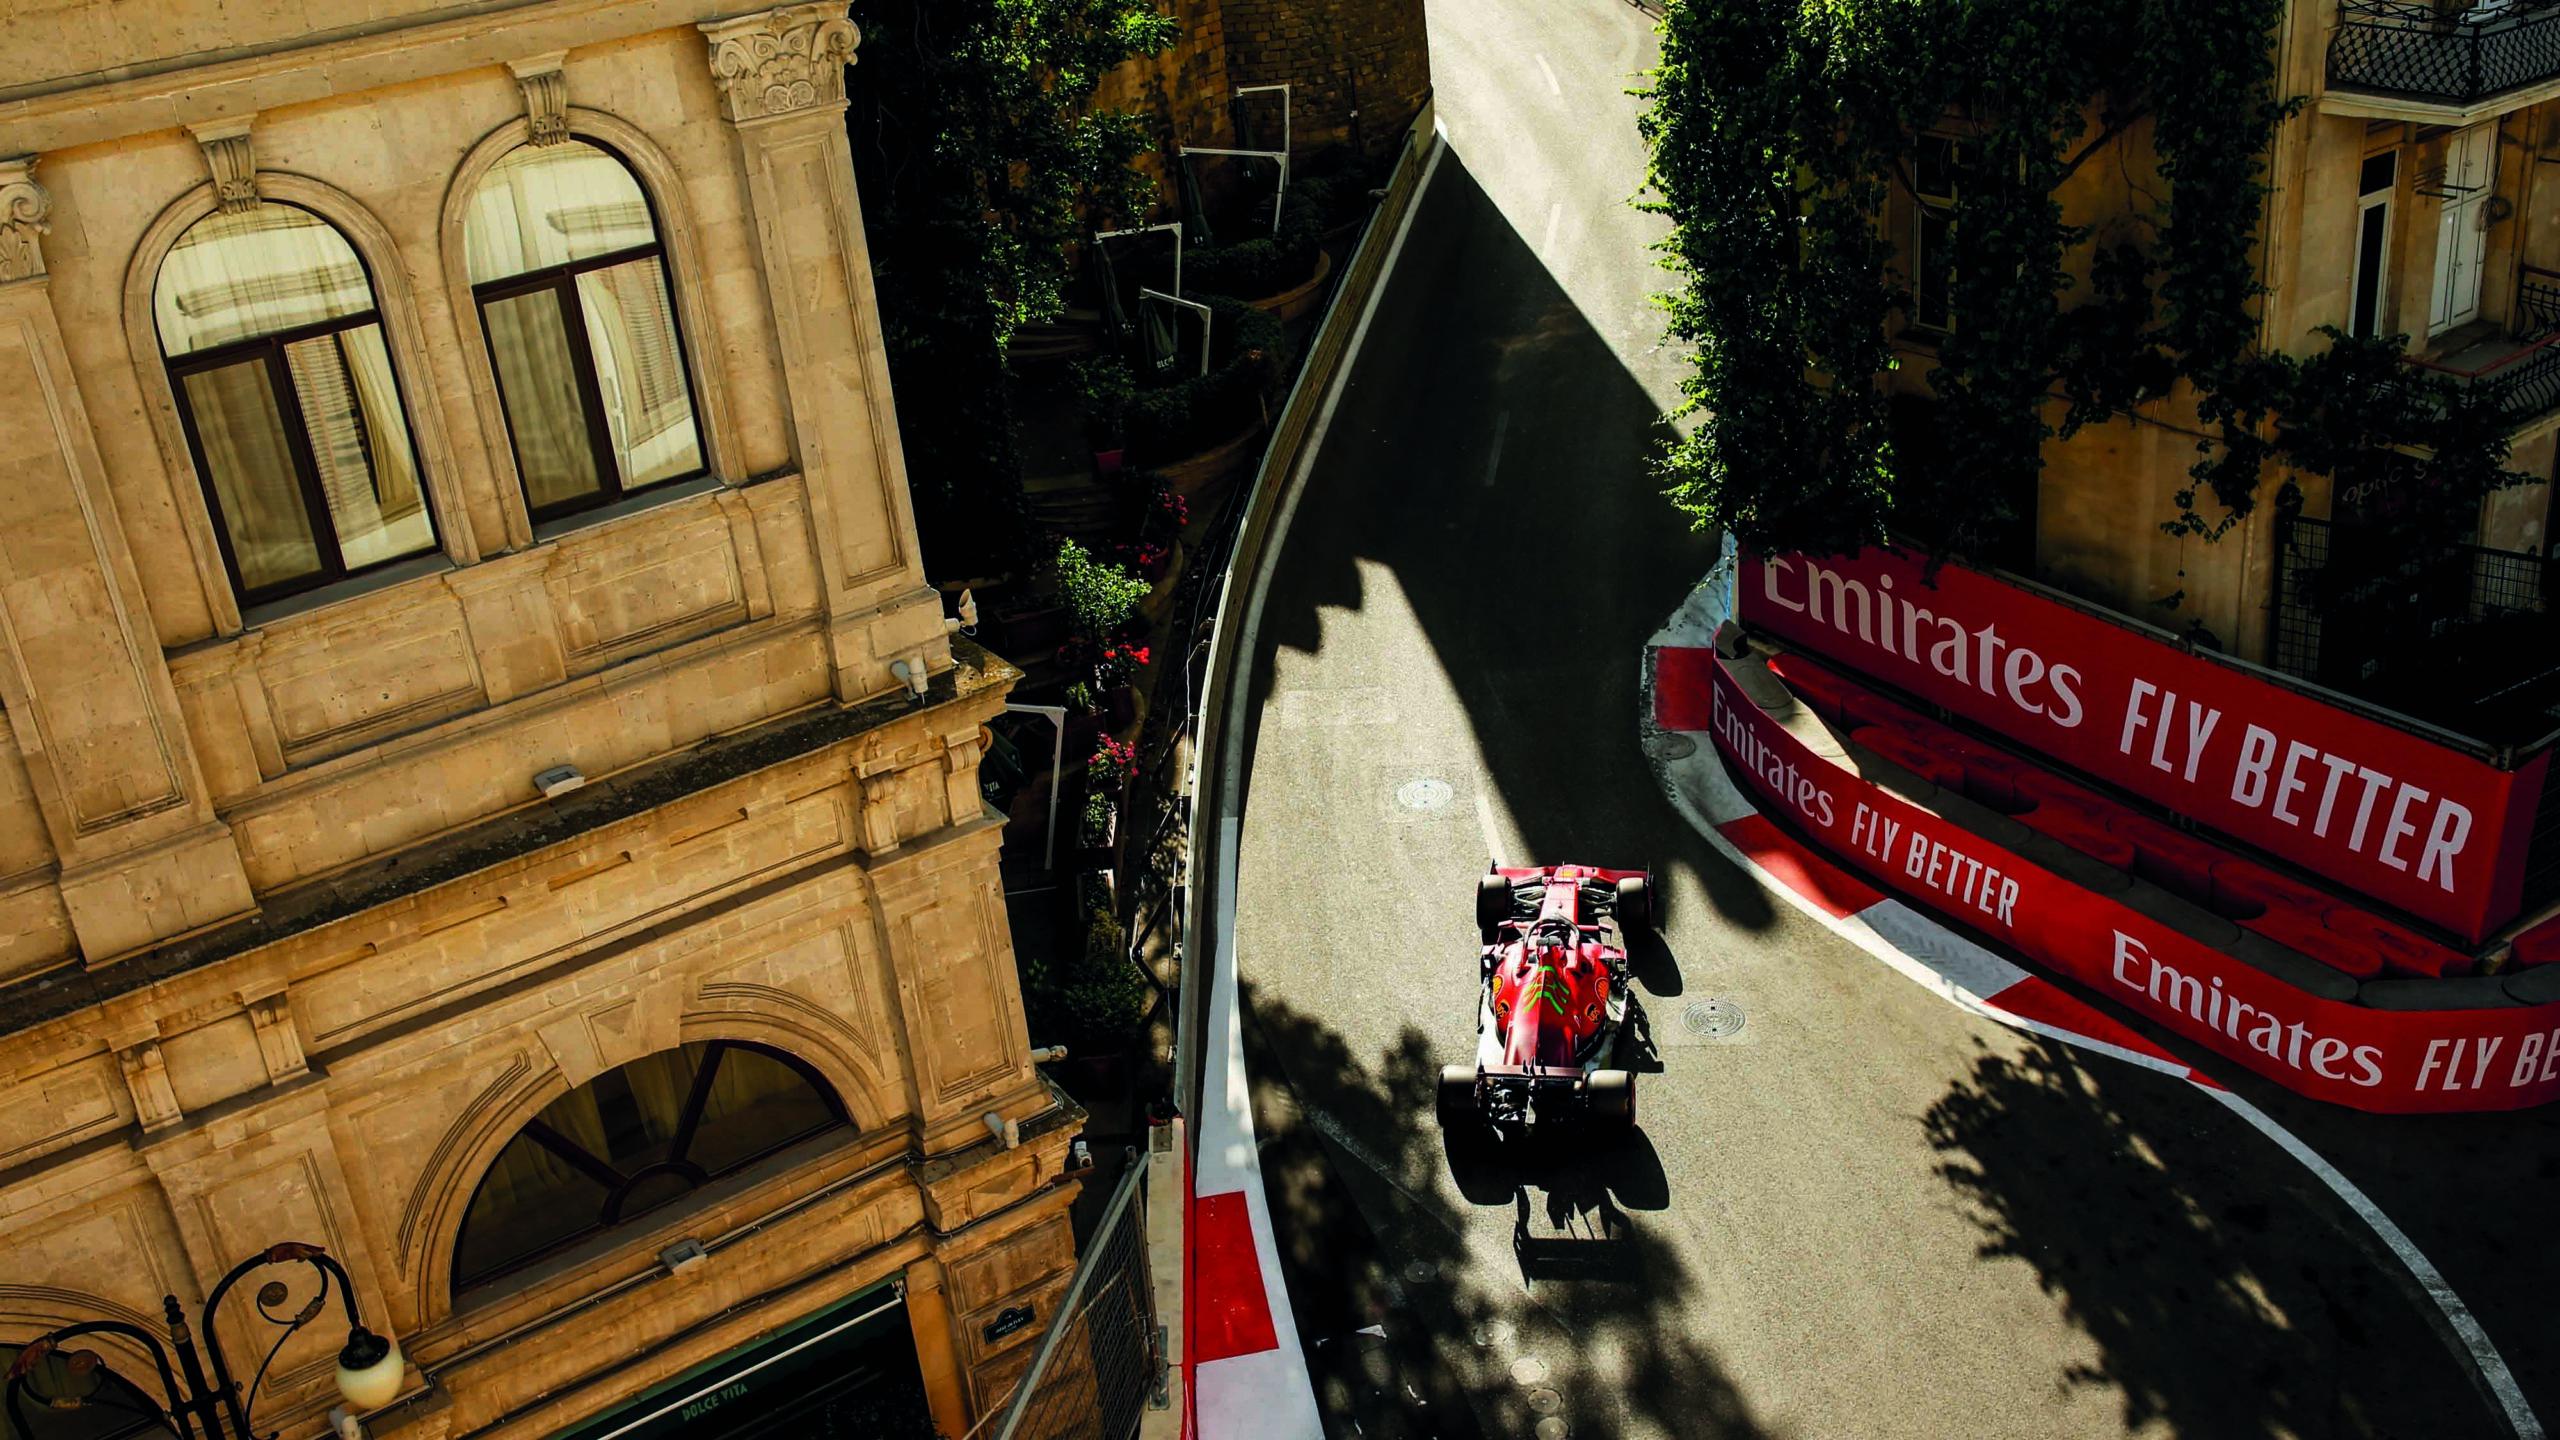 Charles-Leclerc-in-Baku-old-town-during-the-2021-Azerbaijan-Grand-Prix